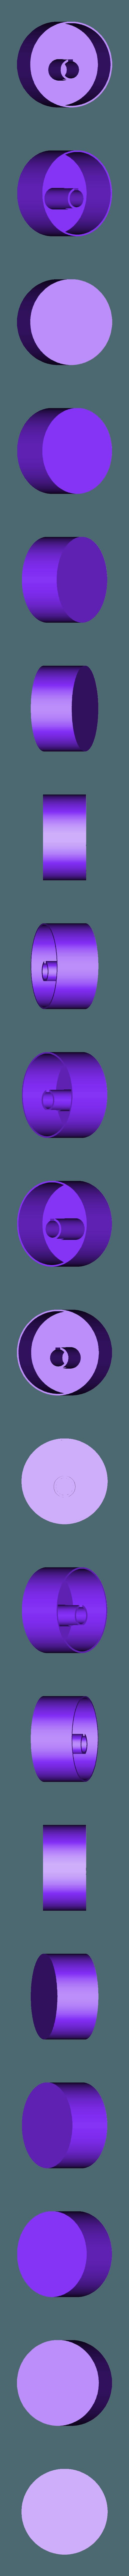 Case with column.stl Download STL file Shadow Lamp • 3D print model, MAyobe